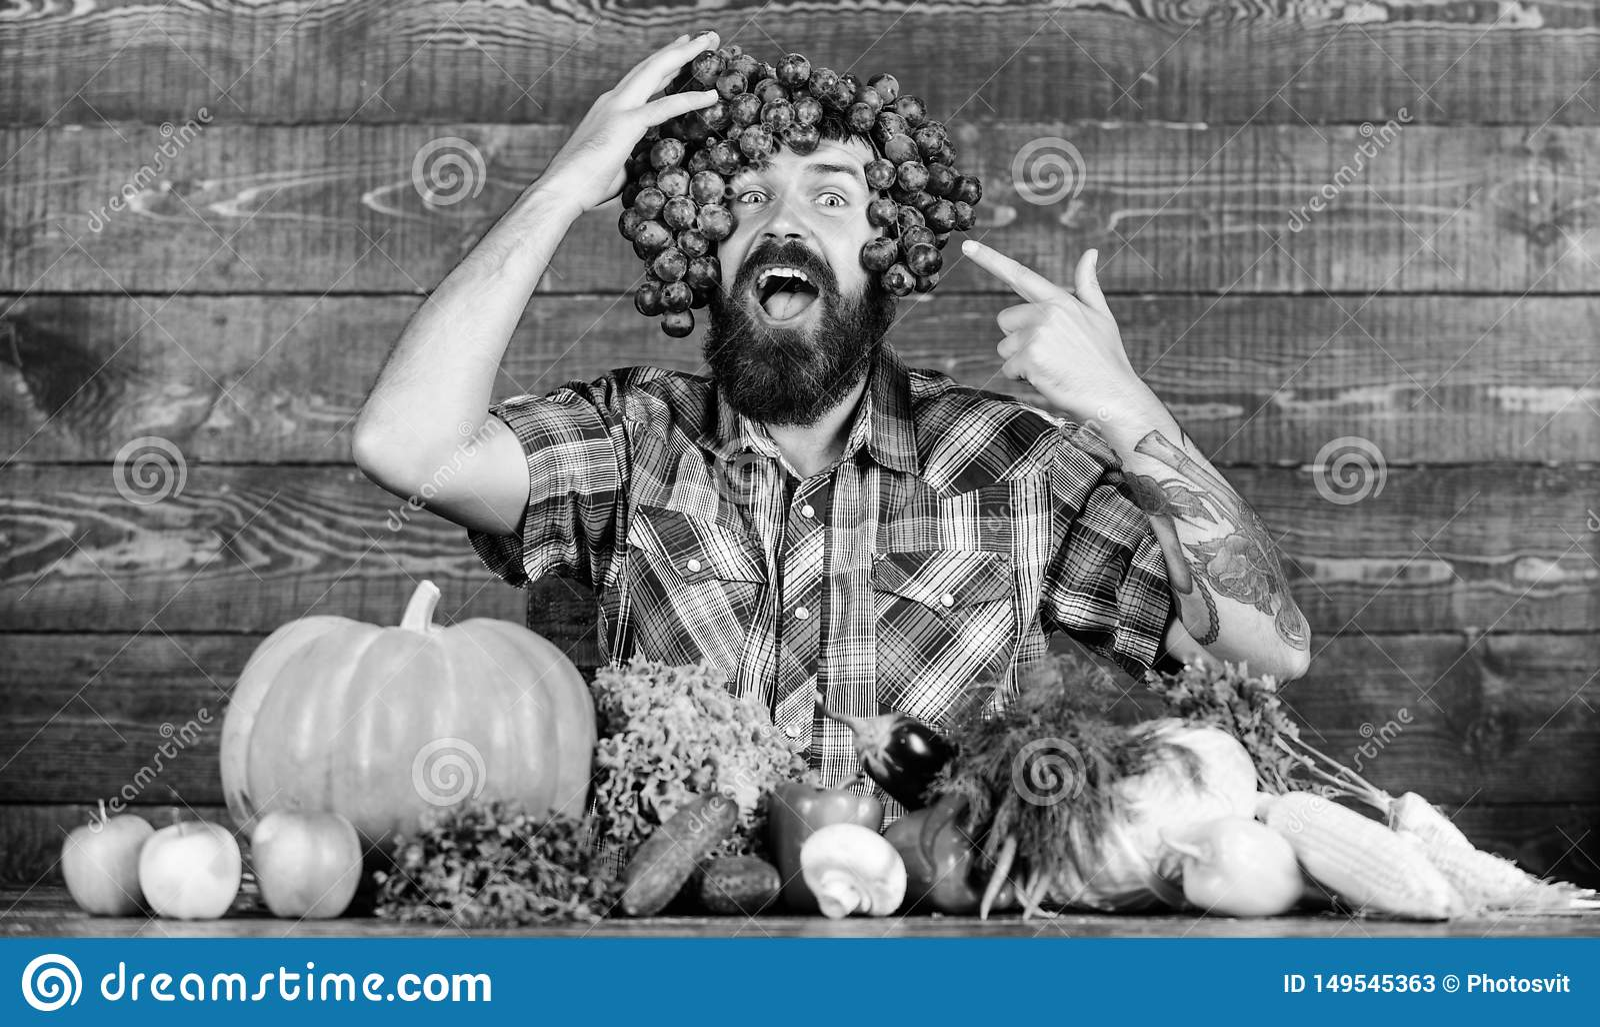 R Ξύλινο υπόβαθρο σταφυλιών λαβής ατόμων Γενειοφόρος τύπος της Farmer τα homegrown σταφύλια συγκομιδών που τίθενται με στο κεφάλι